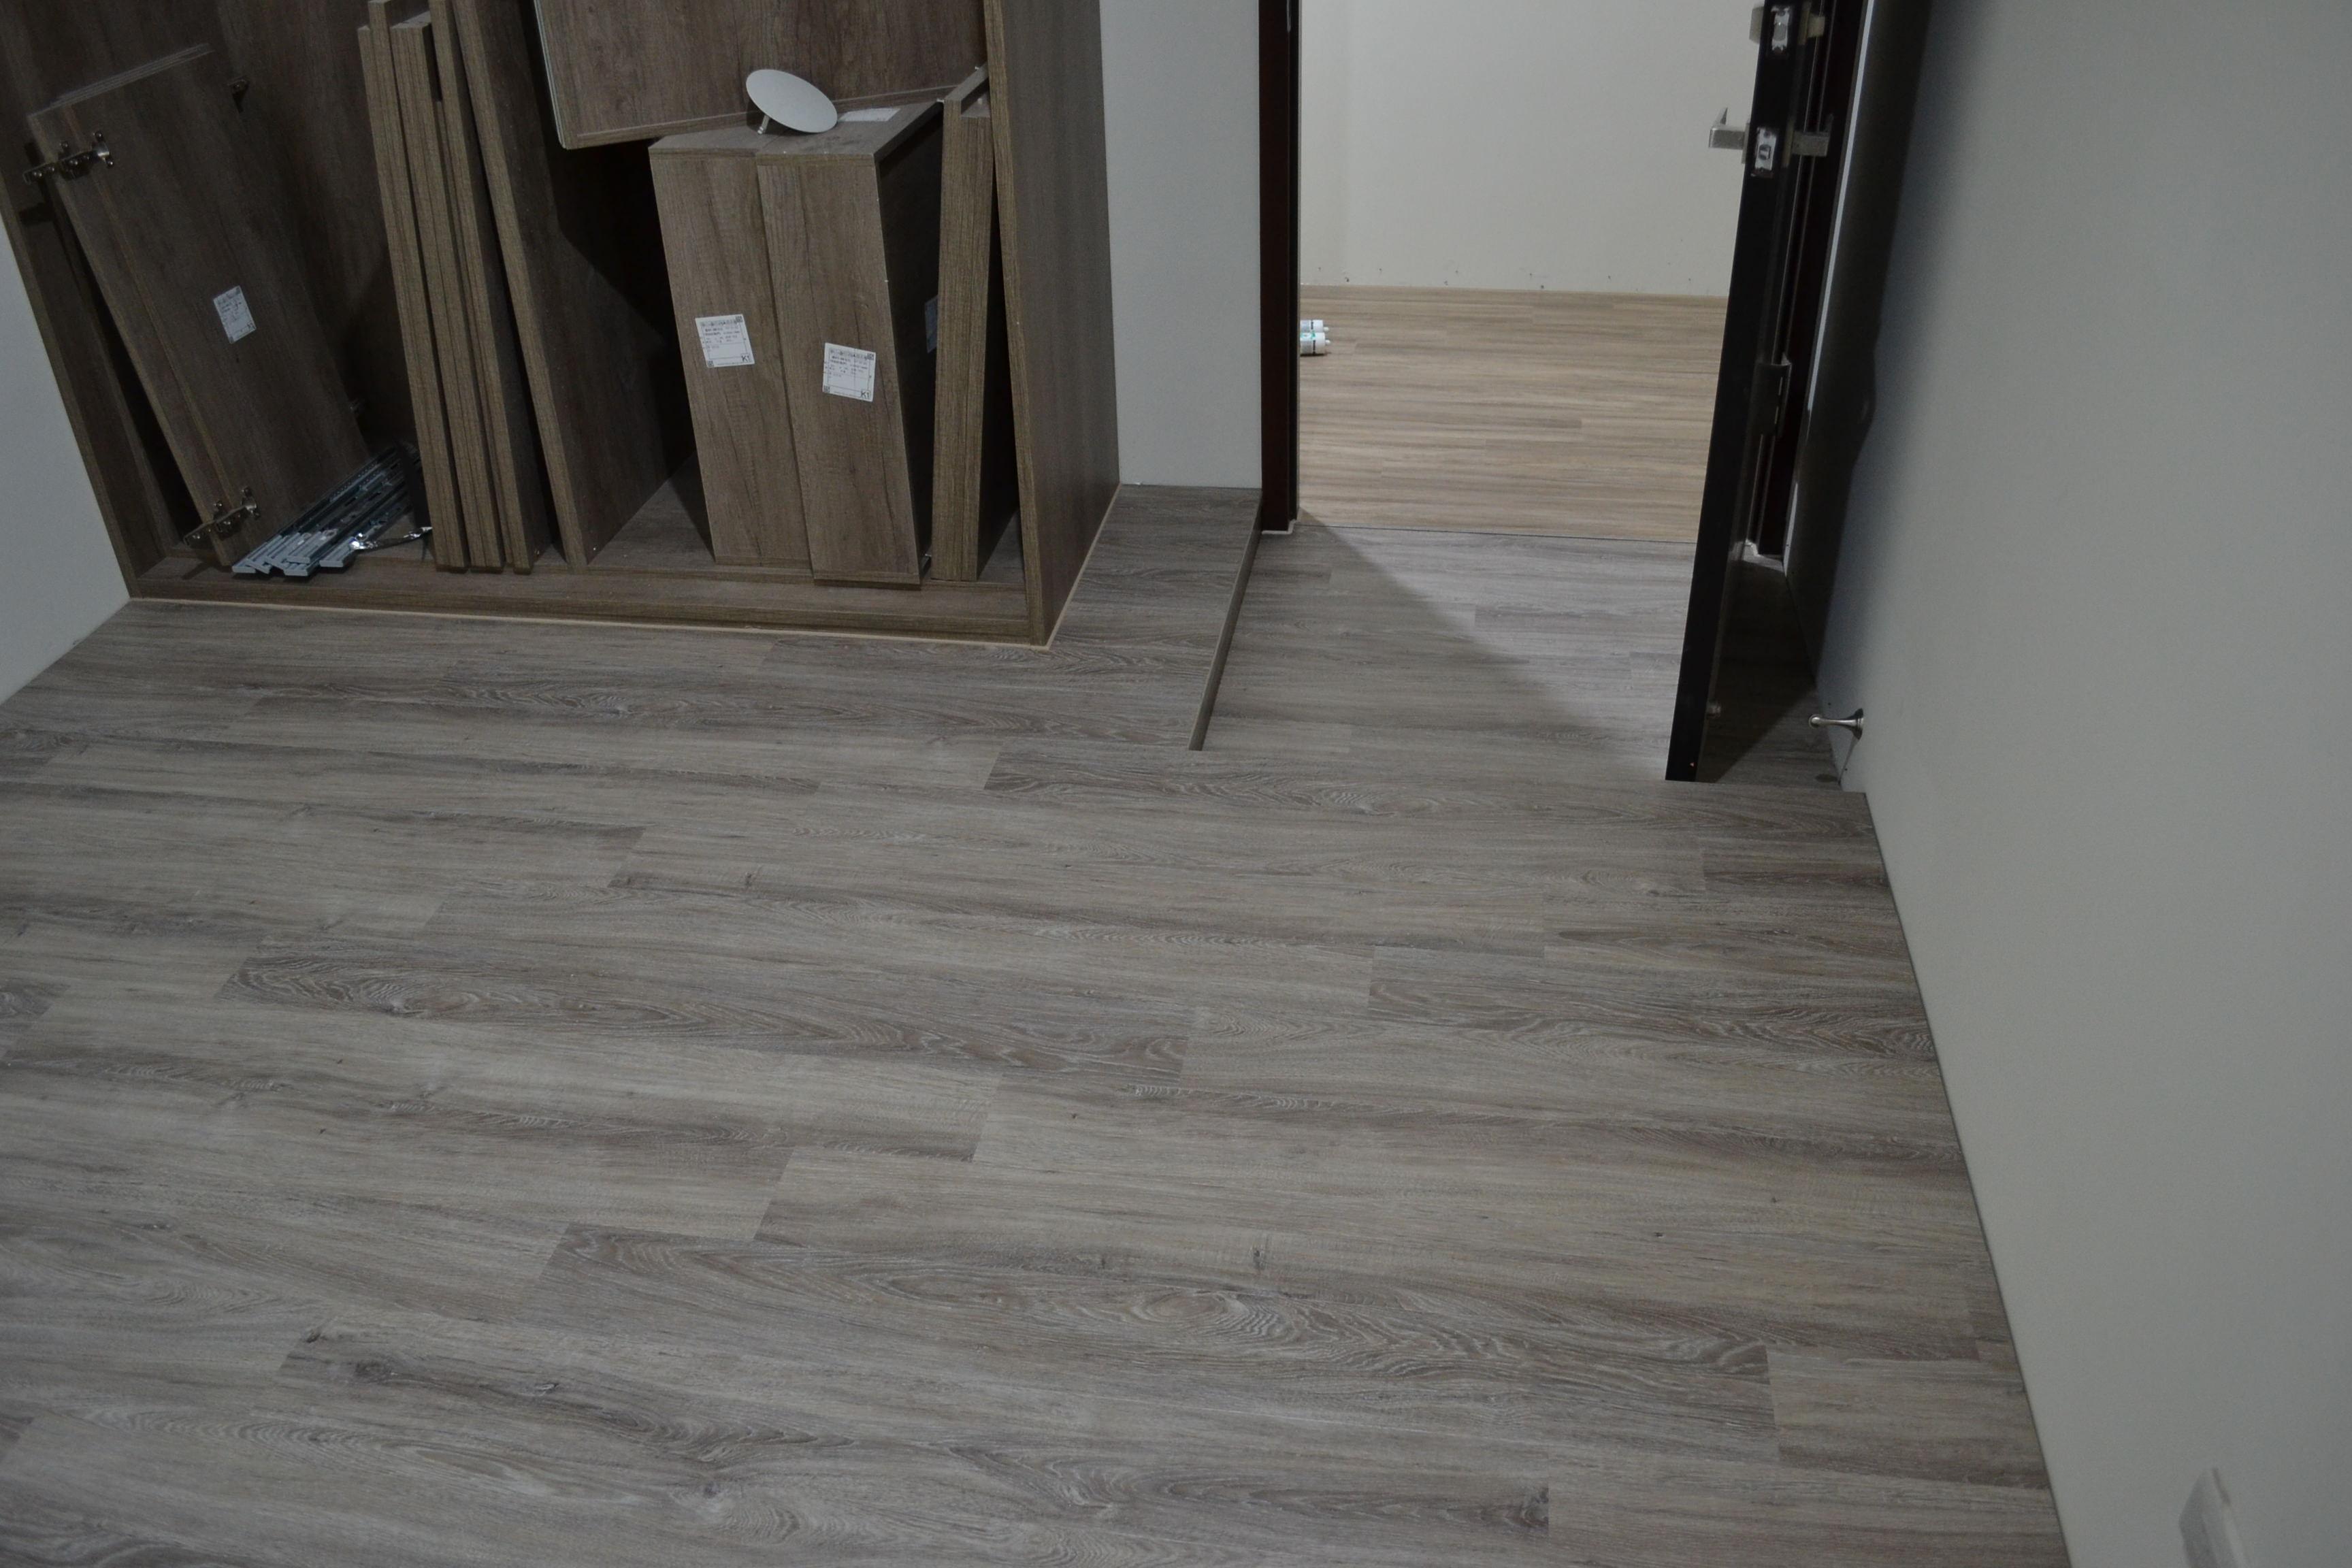 MeiJer WPC高密度木塑鎖扣超耐磨地板 6202 灰色橡木 Oak Pastel-Grey